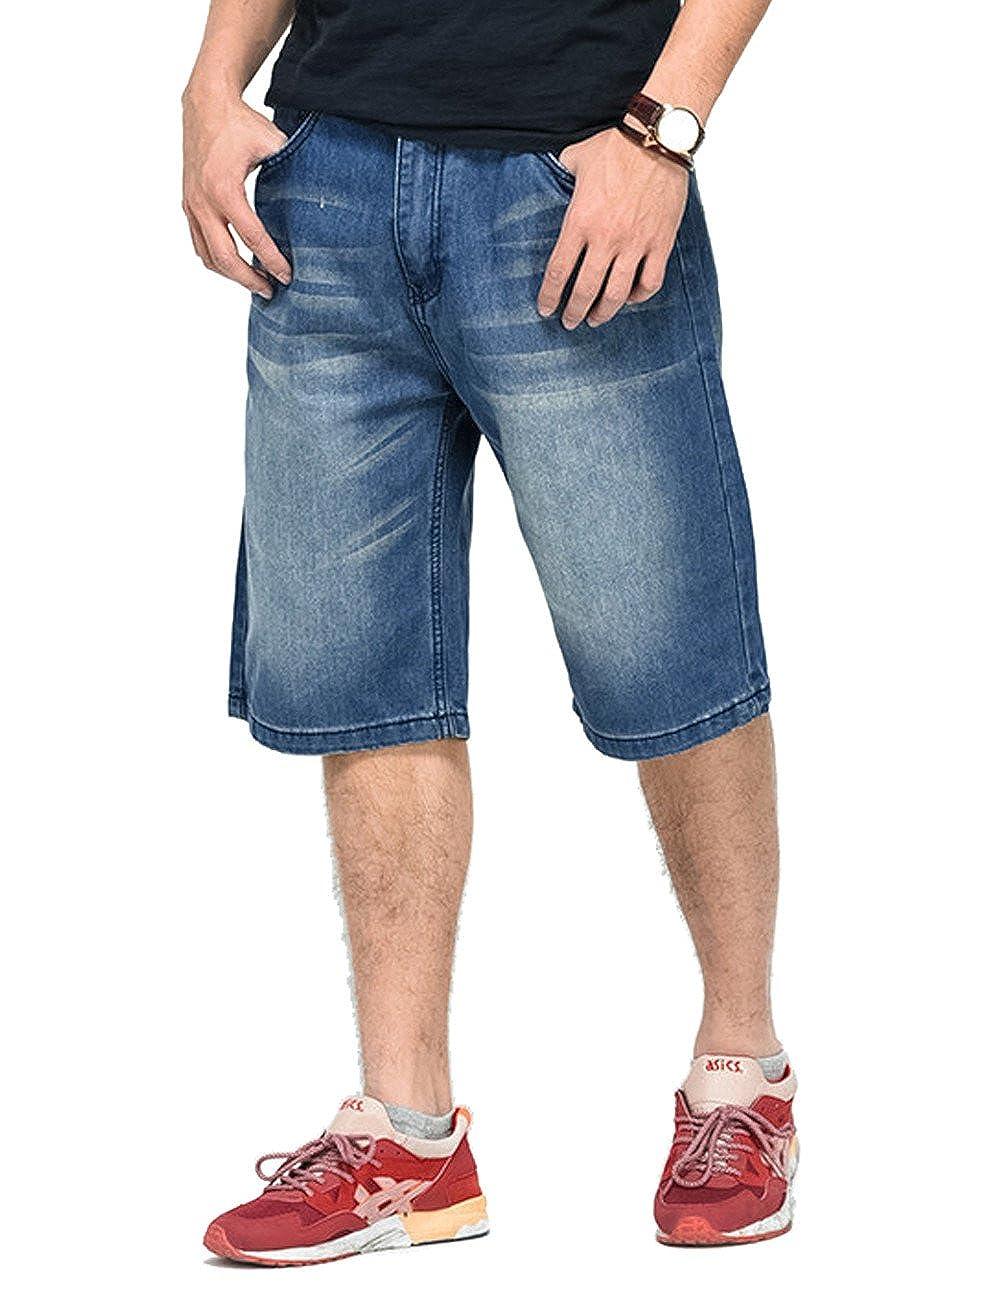 QBO Mens Twill Denim Casual Shorts Jeans